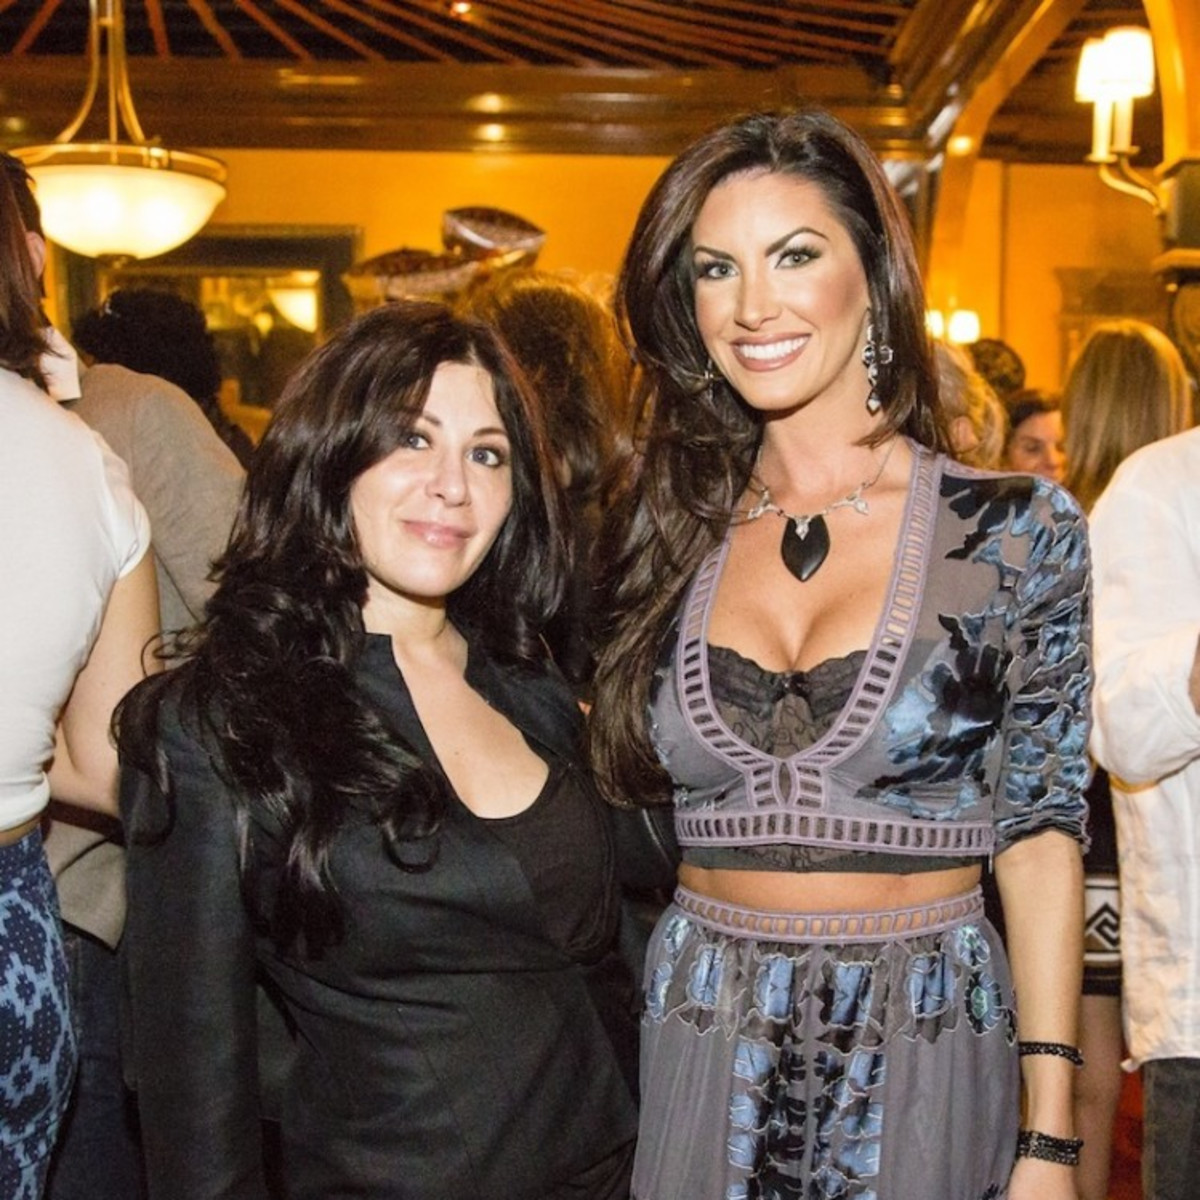 News, Shelby, Beth Muecke b'day, Oct. 2015  Victoria Zavala, Nicole Lassiter